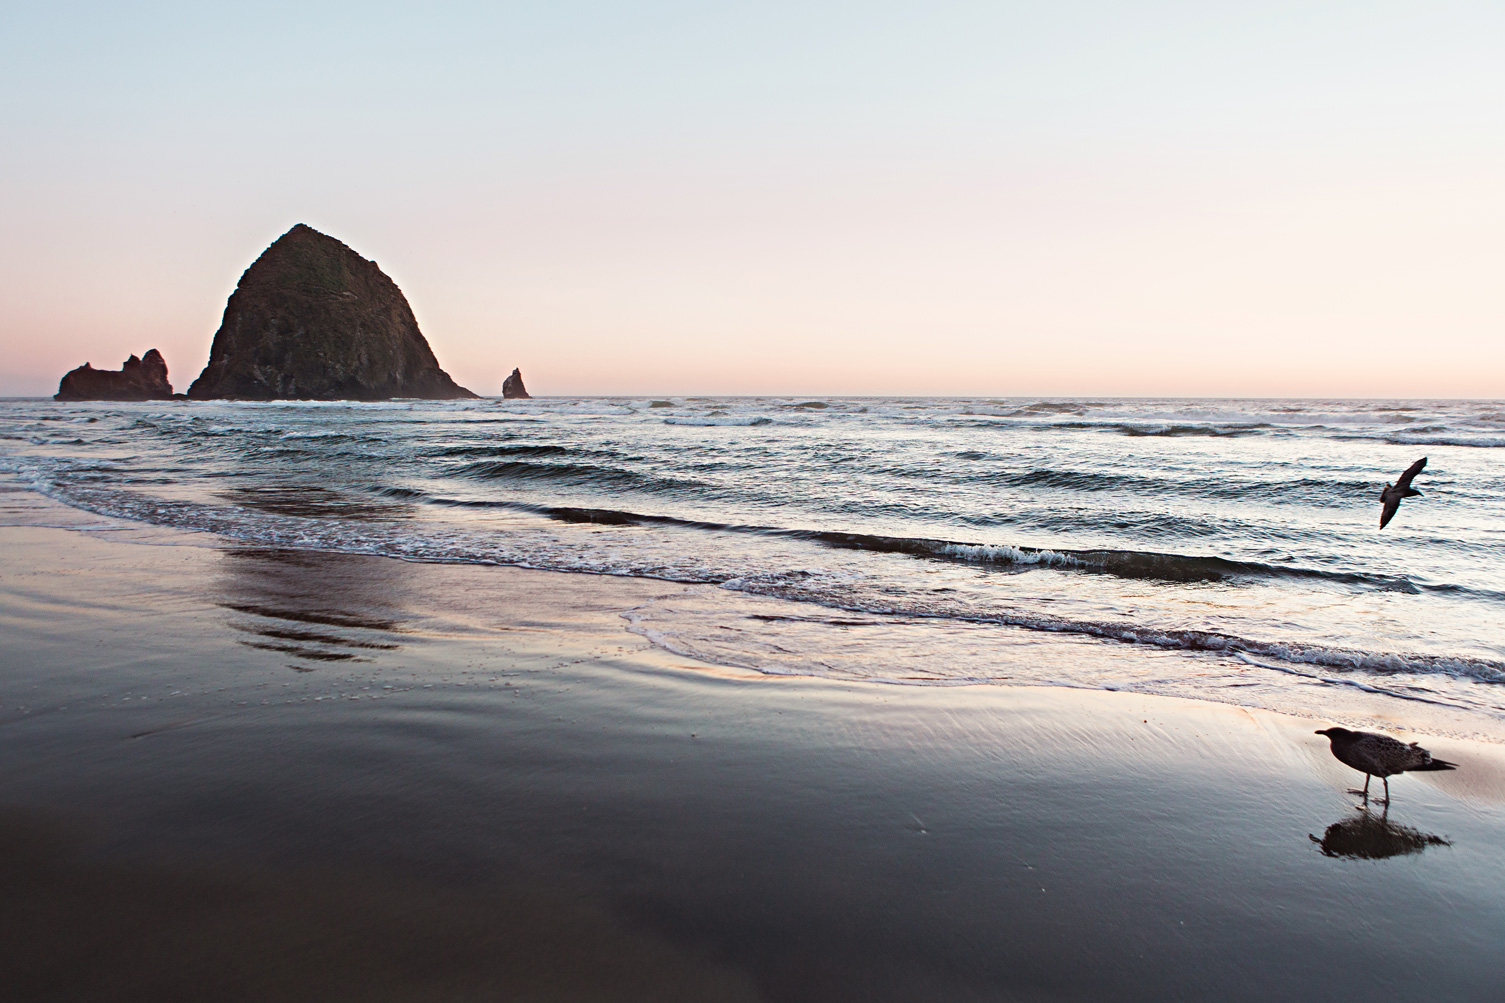 CindyGiovagnoli_Crater_Lake_National_Park_Cape_Perpetua_Heceta_Head_lighthouse_Pacific_Ocean_Cannon_Beach_haystack_Oregon_coast-020.jpg